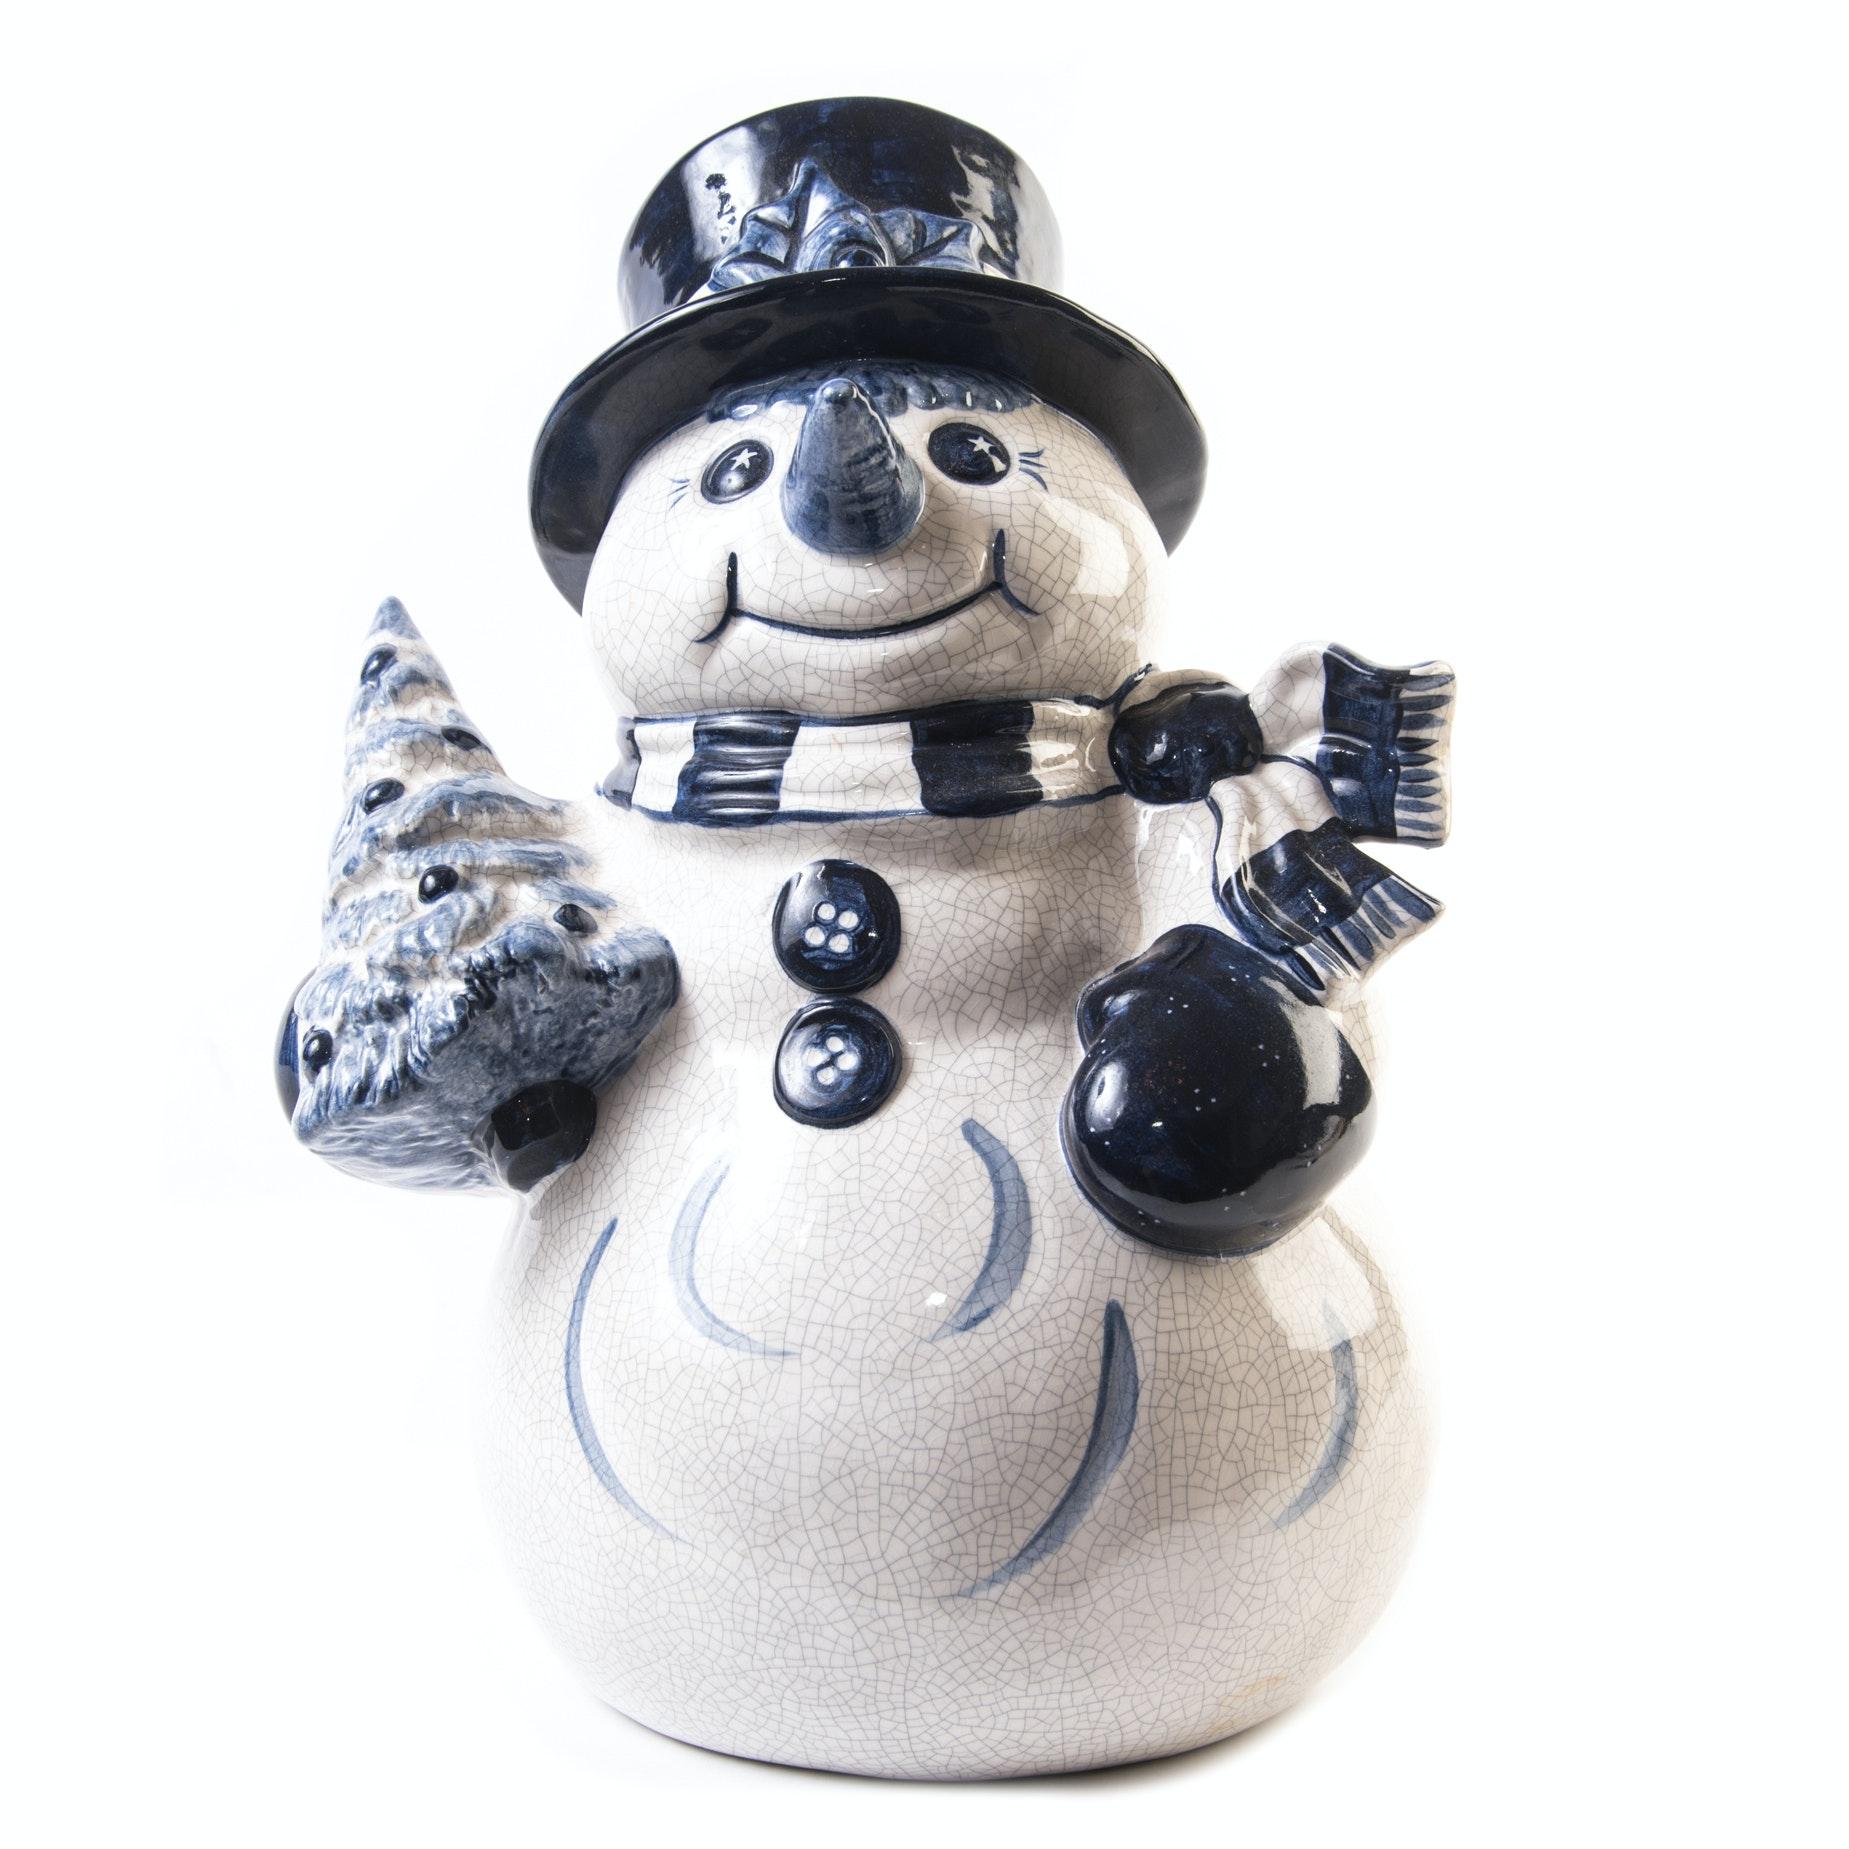 Ceramic Snowman Figurine